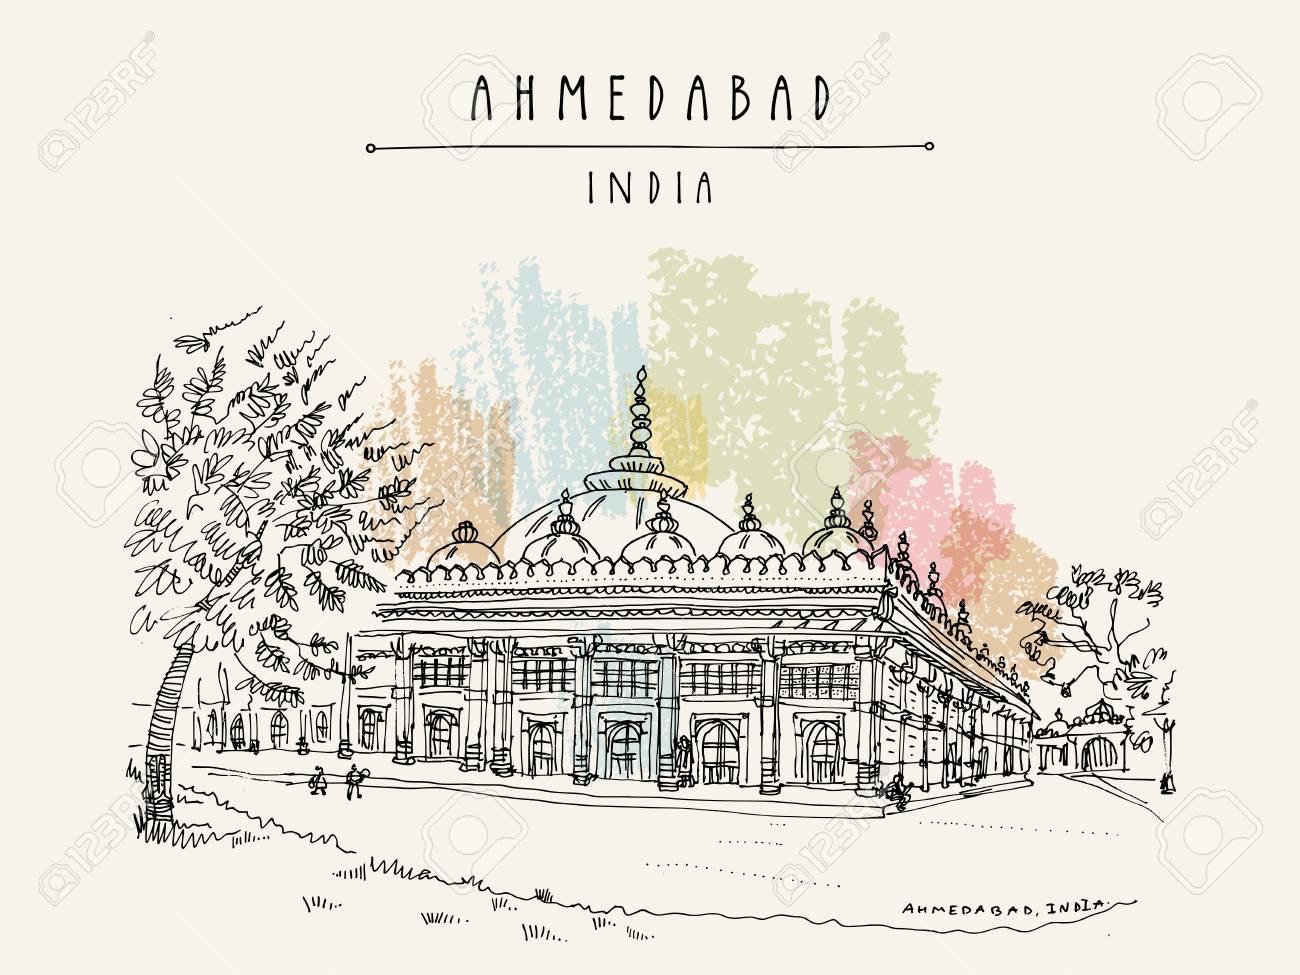 Carte Inde Ahmedabad.Tombe De Cheikh Ganj Baksh A Sarkhej Roza Pres D Ahmedabad Ahmadabad Gujarat Inde Pierre Ornee Art De Croquis De Voyage Carte Postale Vintage